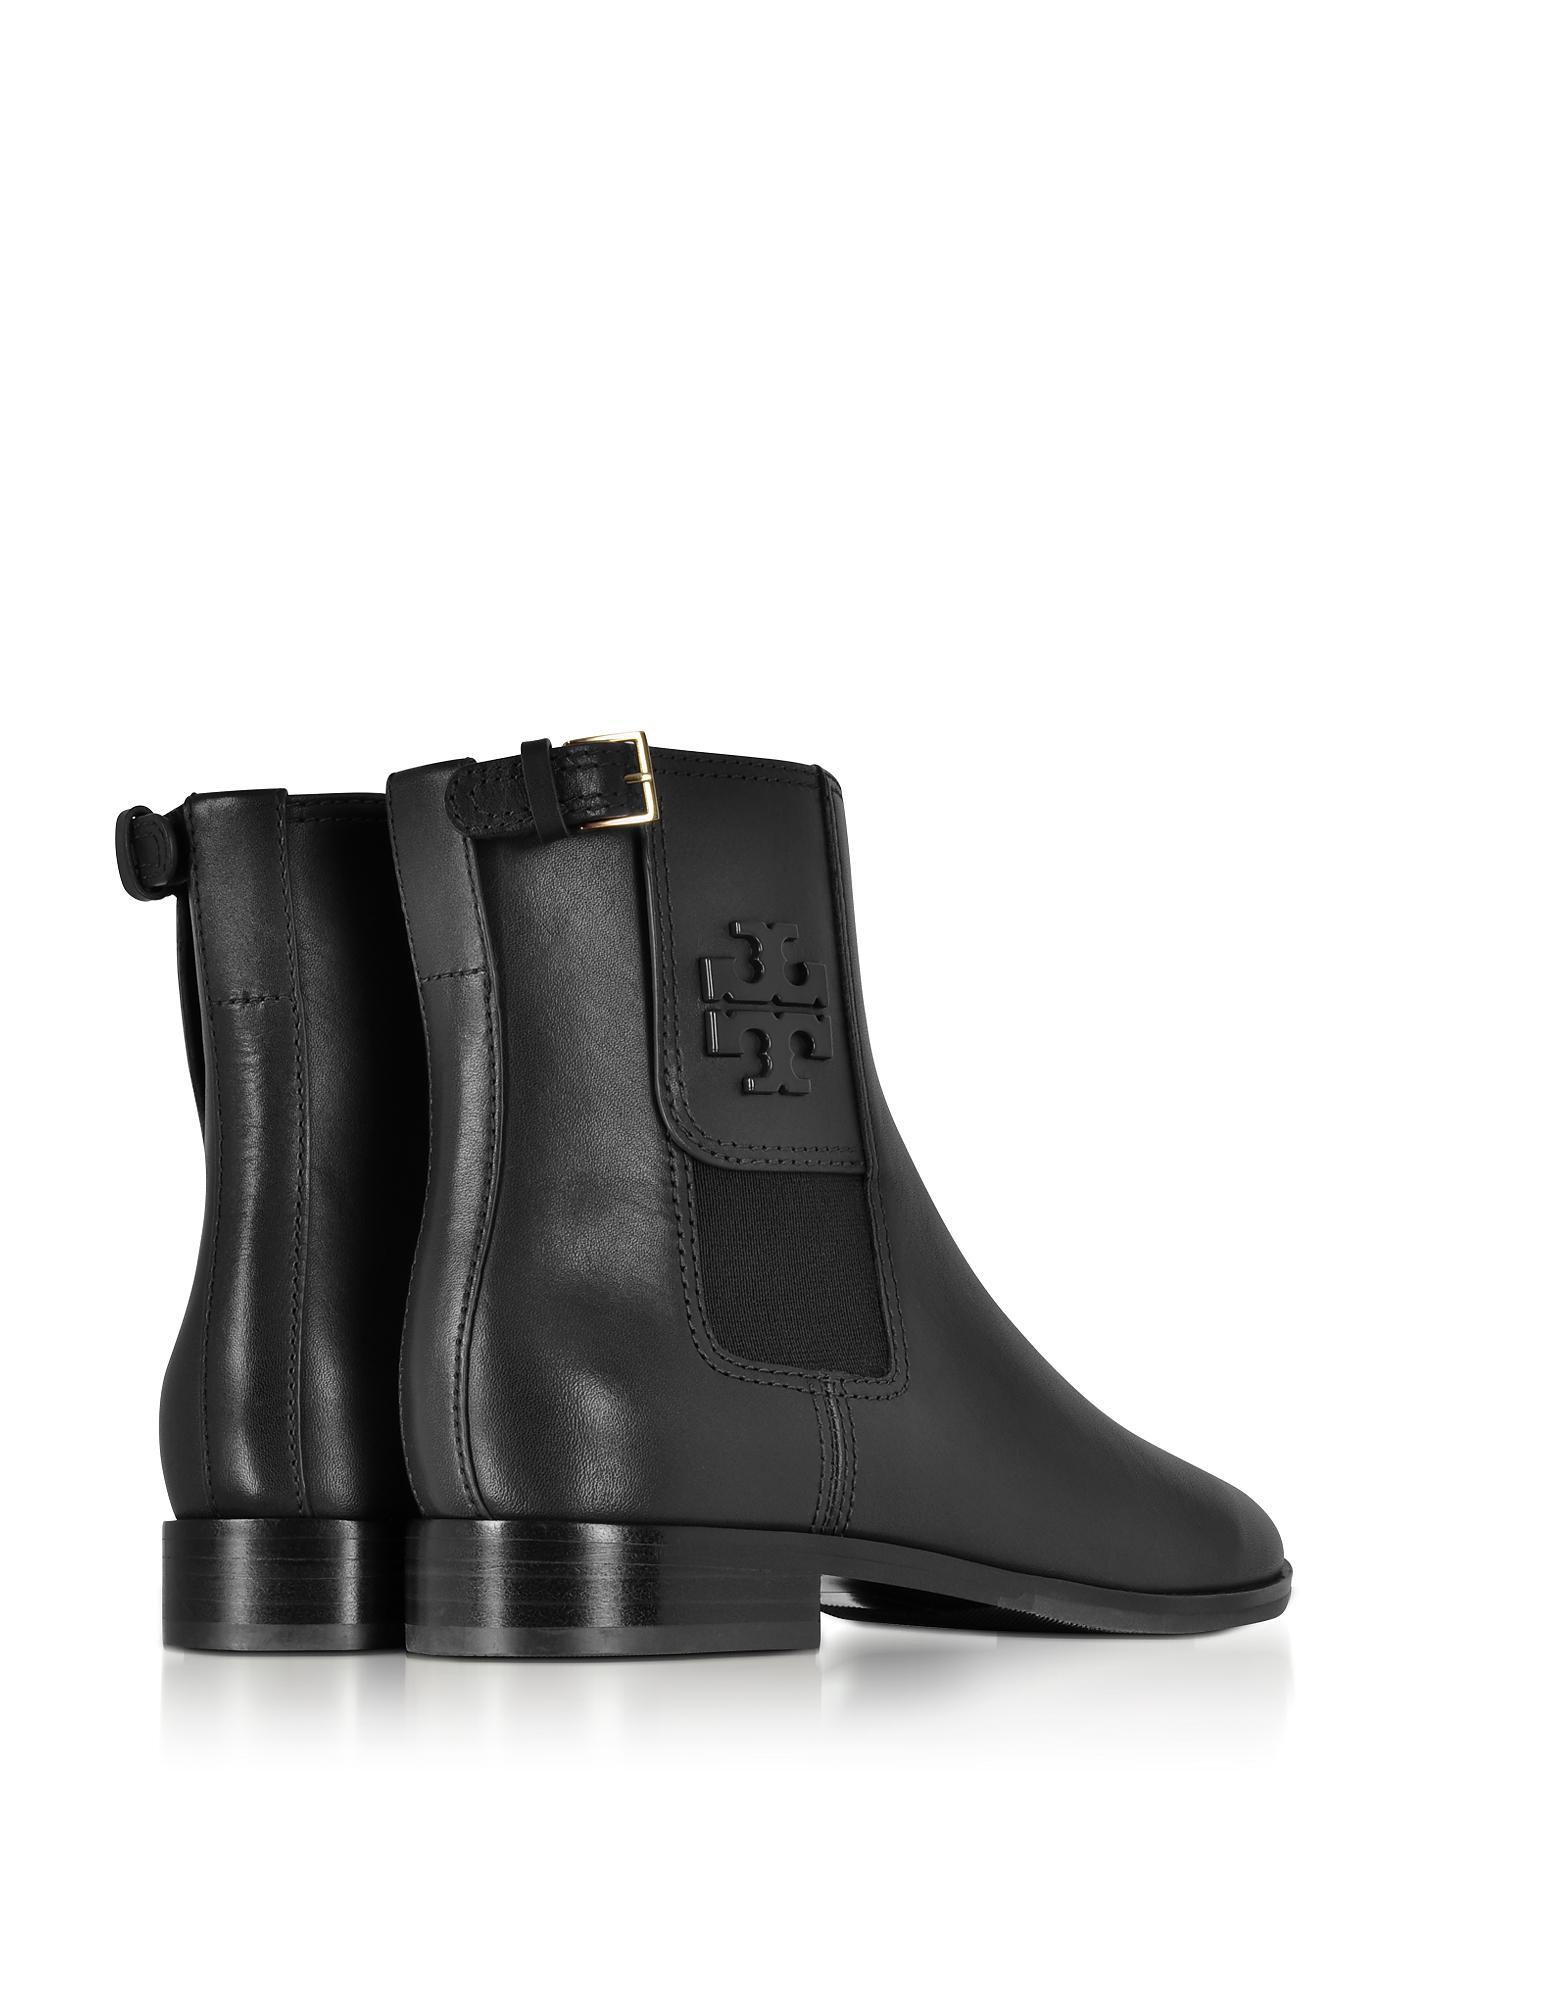 782a92d8b26 Lyst - Tory Burch Wyatt Black Leather Bootie in Black